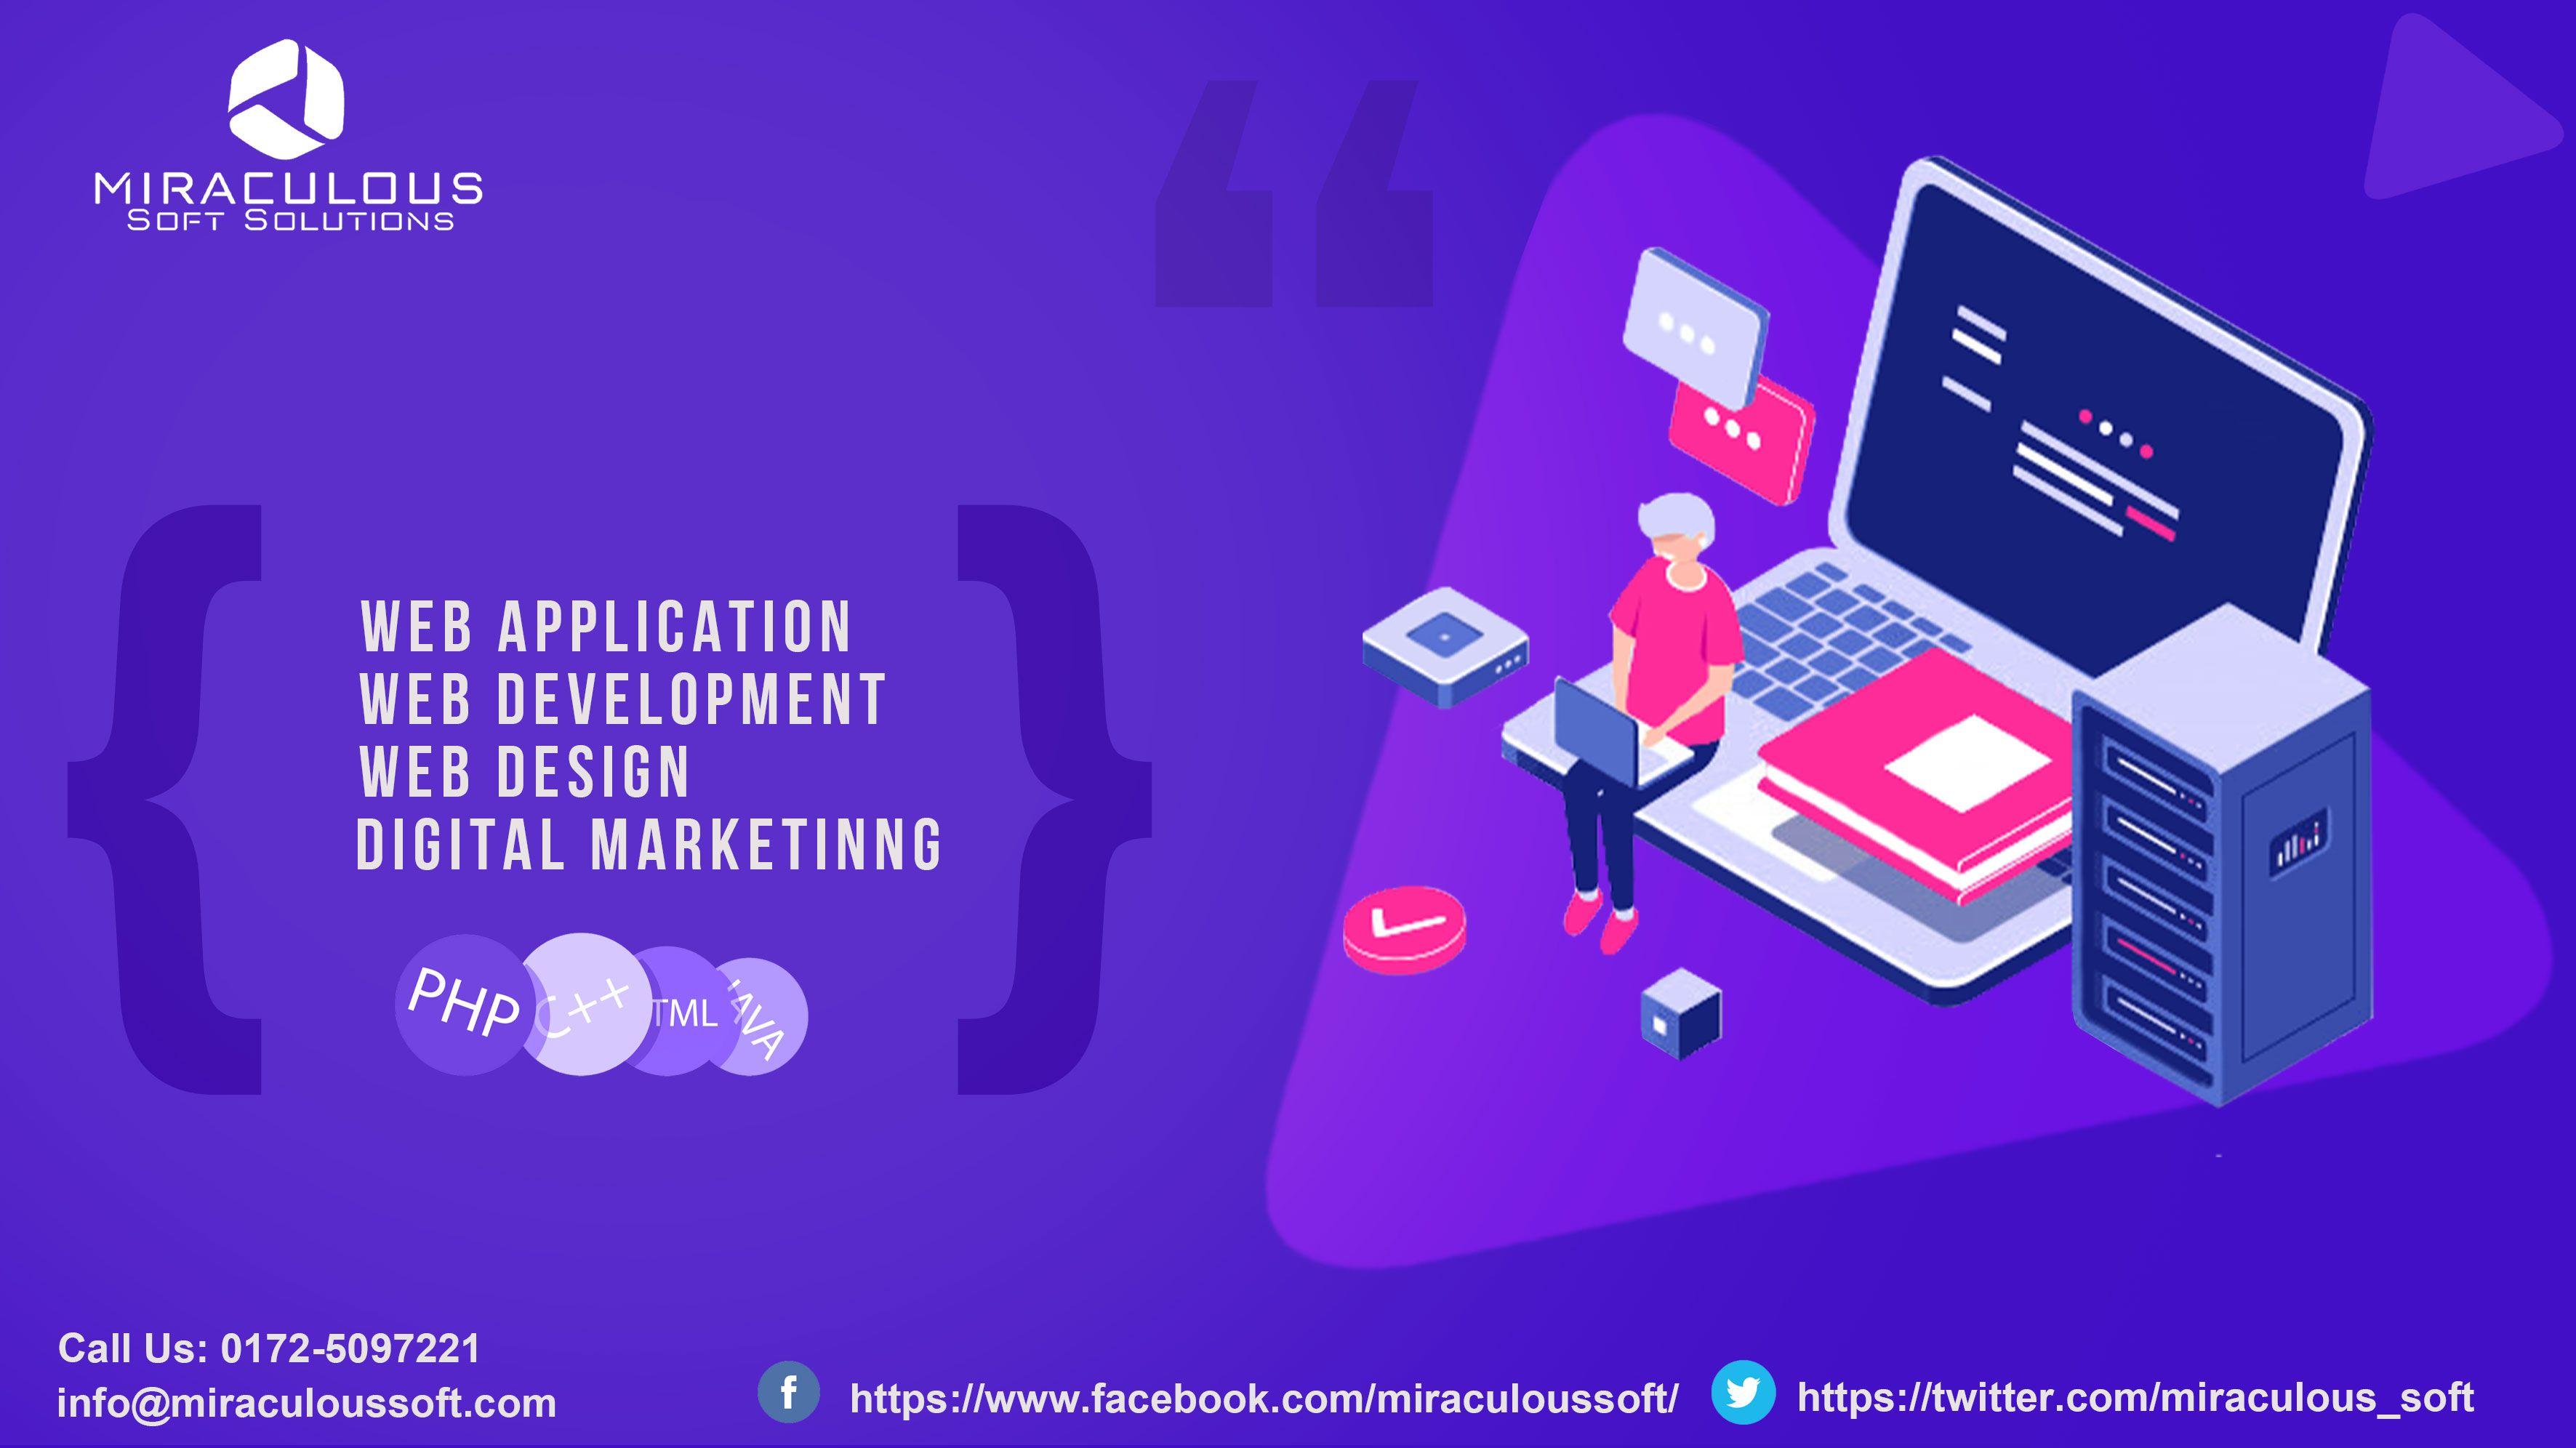 Web Design Digital Marketing Agency Montreal Digital Marketing Agency Web Design Web Development Design